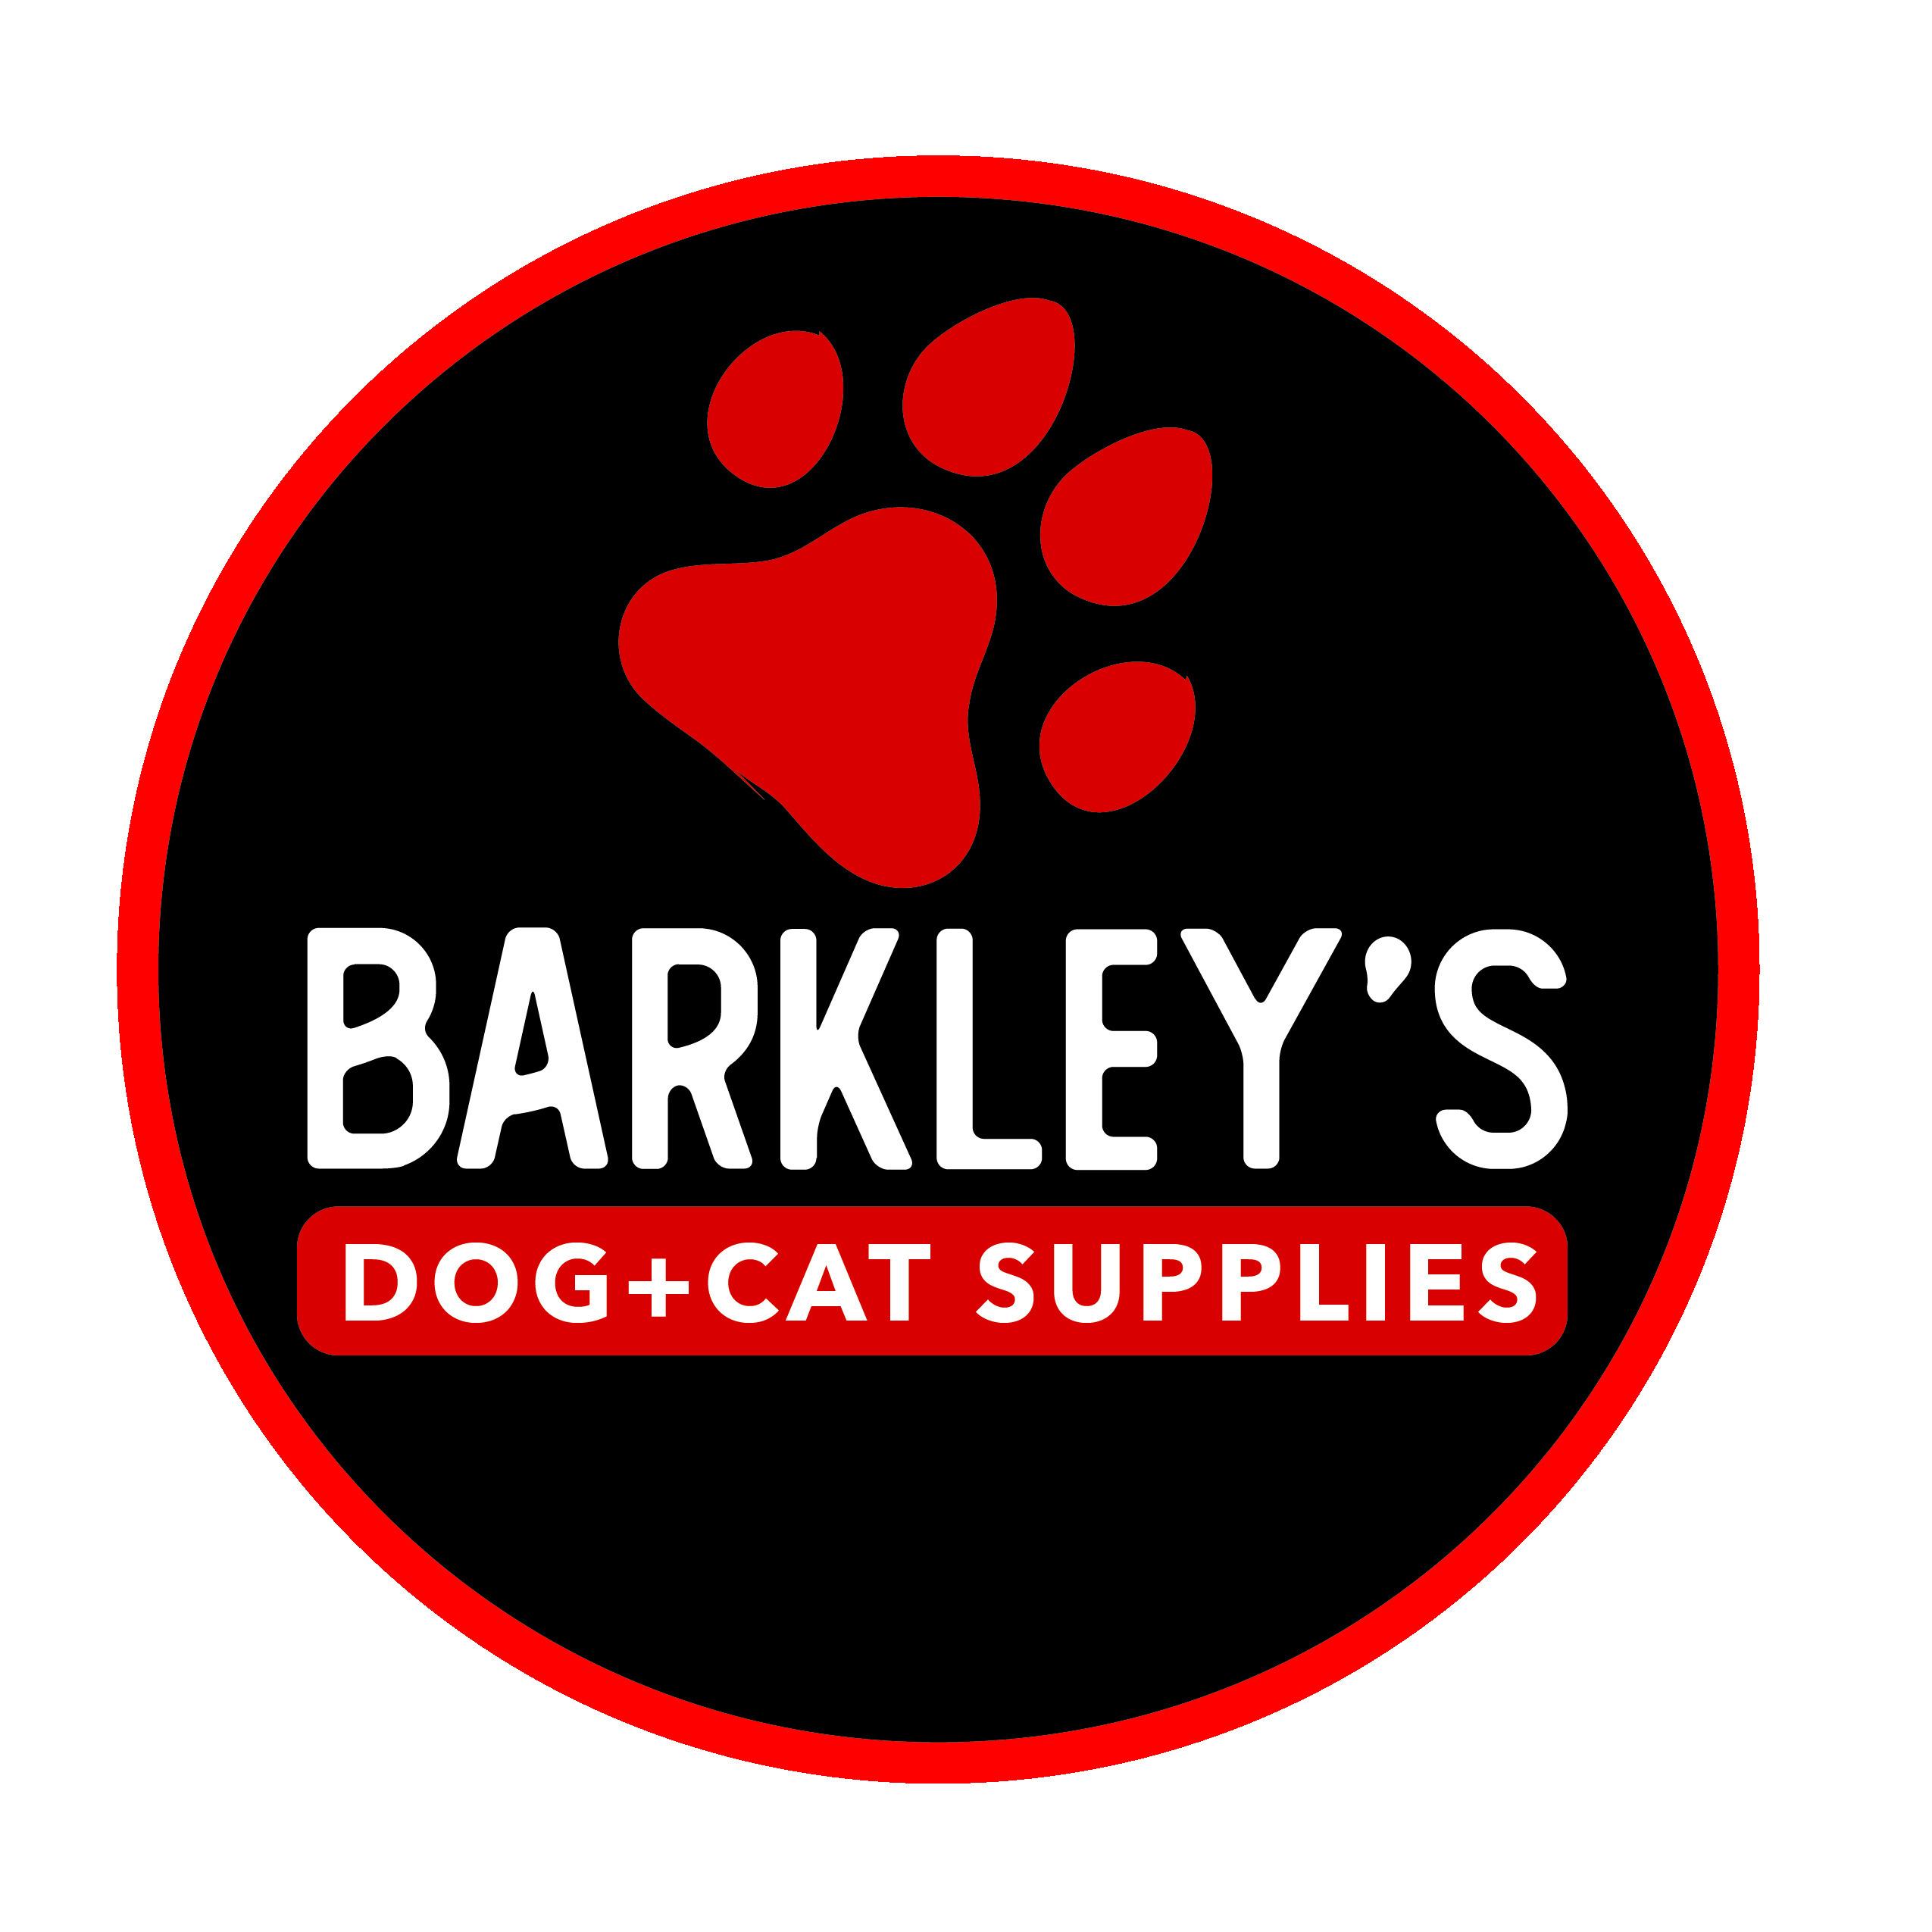 A088e2f509e9c78b4bf7 barkleys social media logo 2021 01